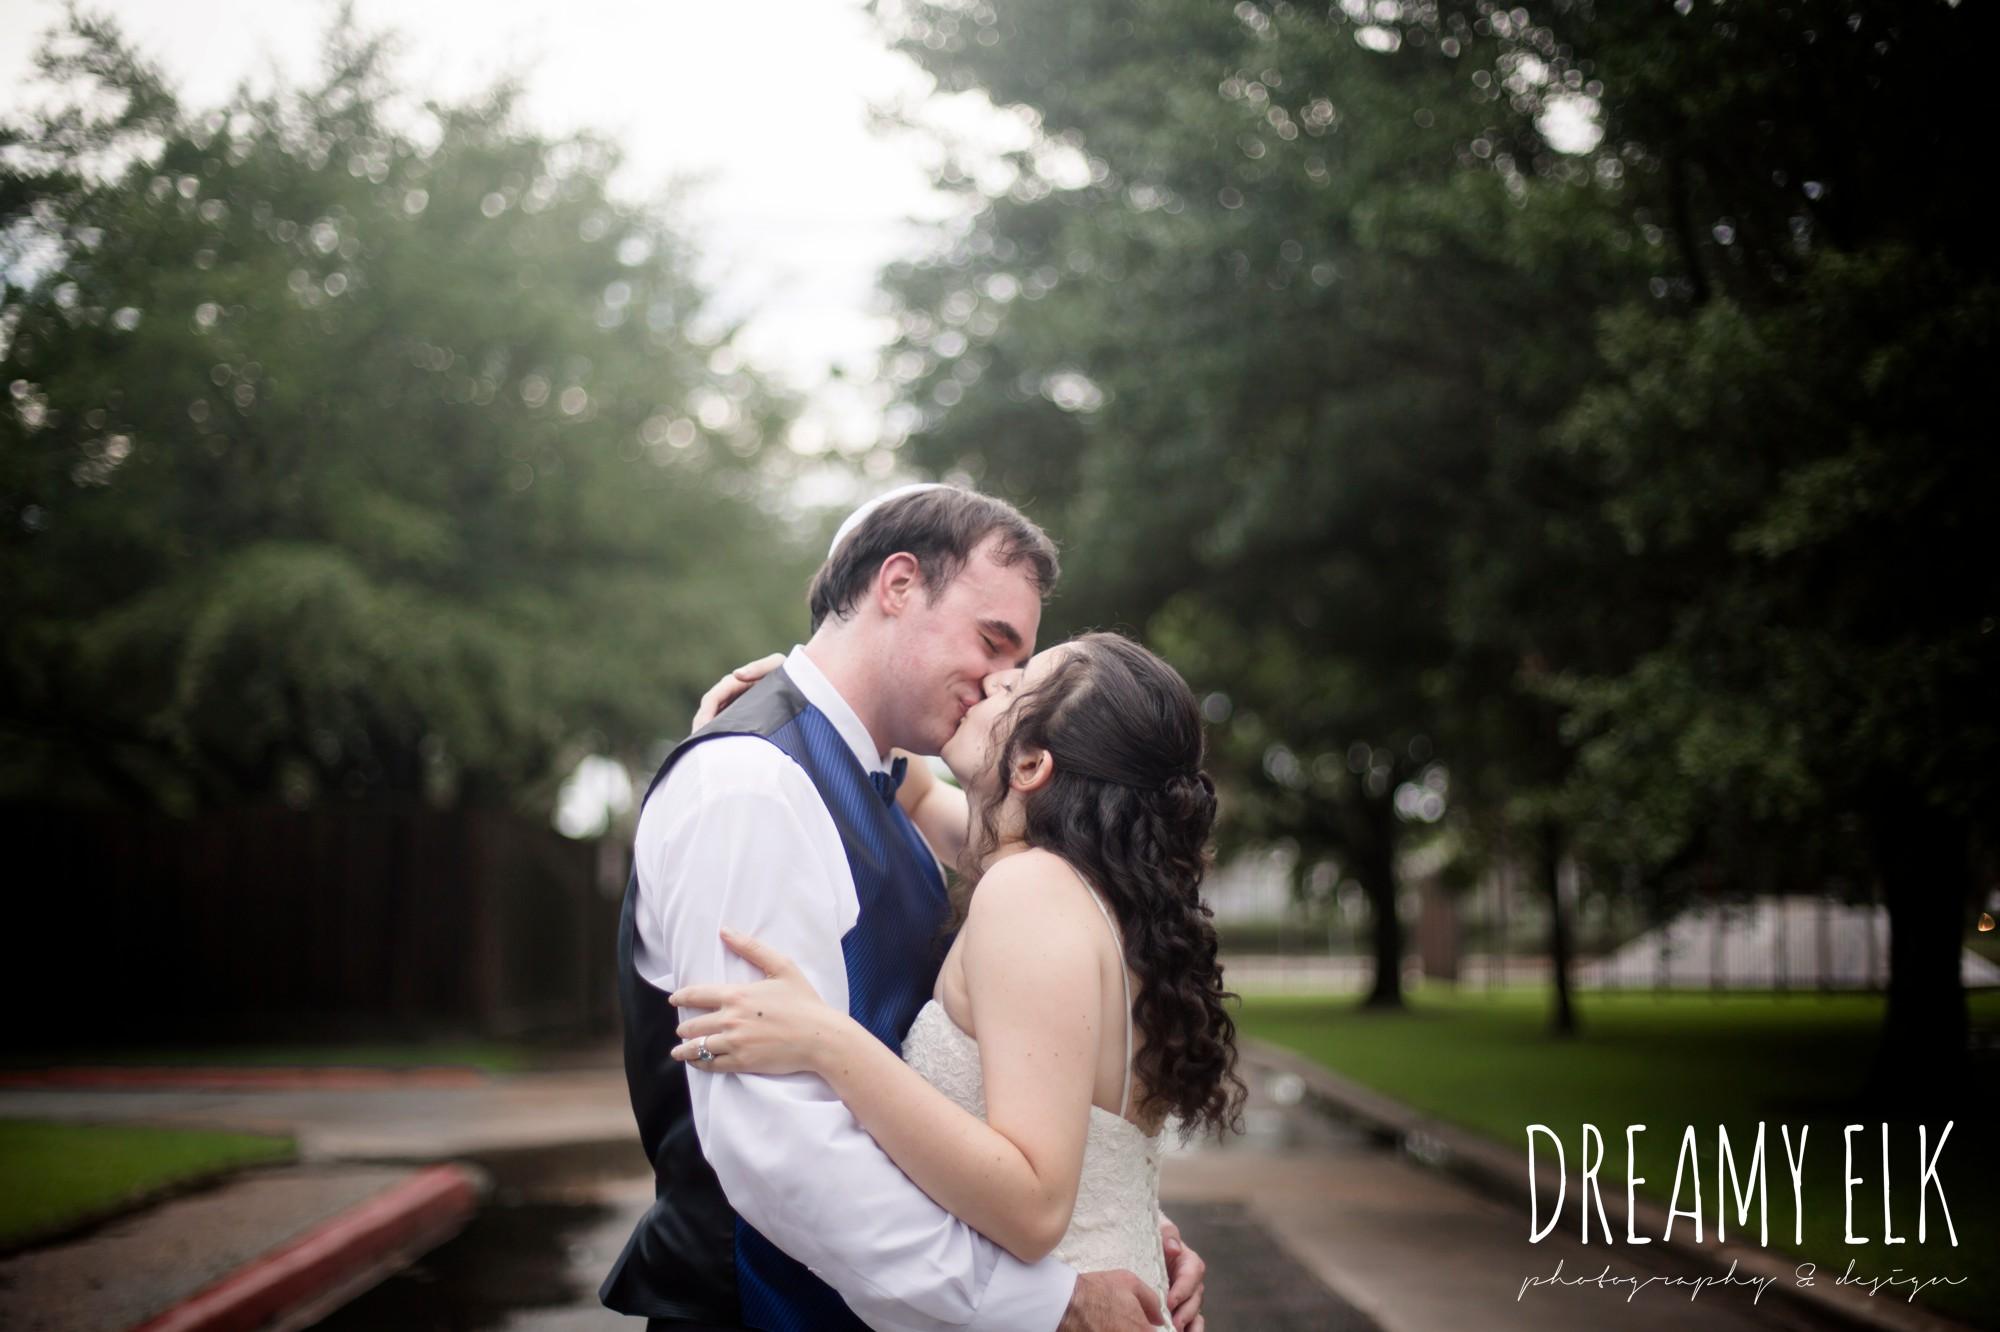 bride and groom, summer june jewish wedding photo {dreamy elk photography and design}